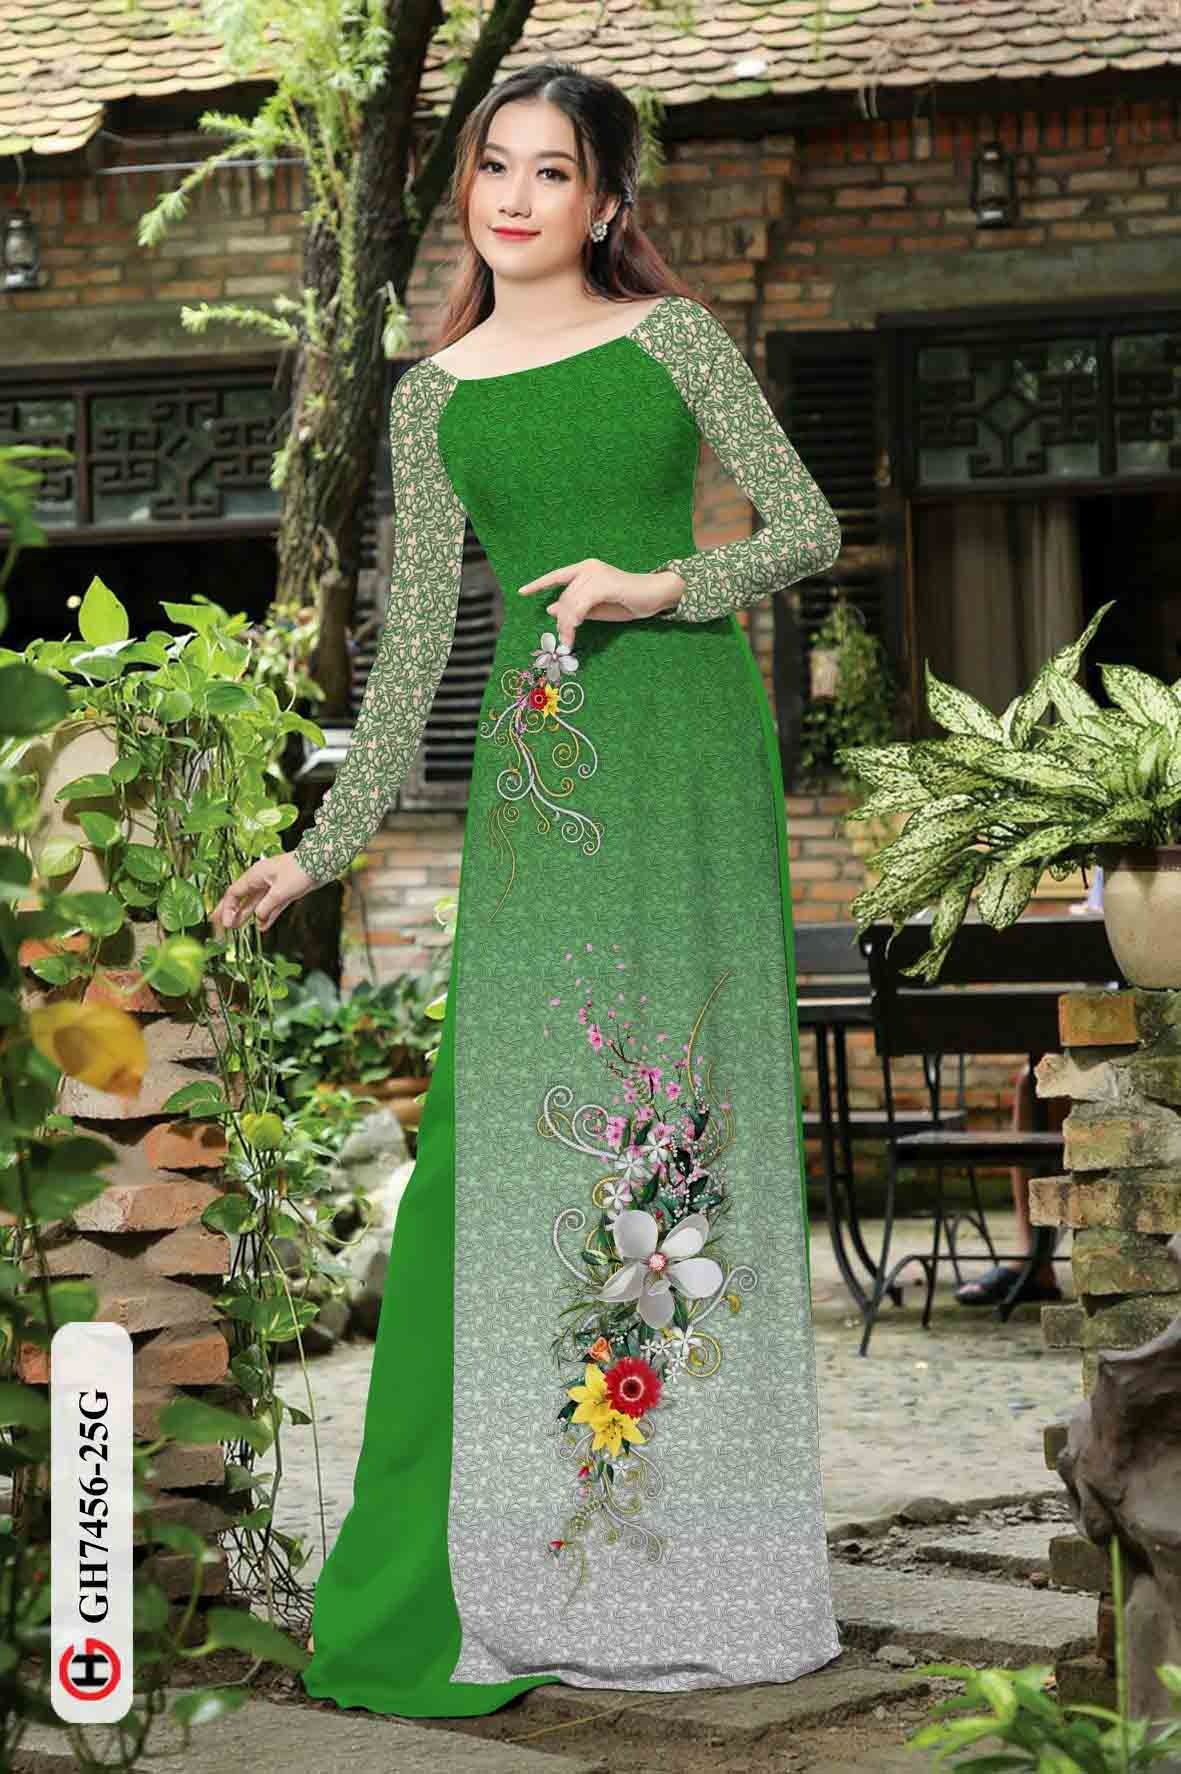 Vải áo dài hoa in 3D AD GH7456 36